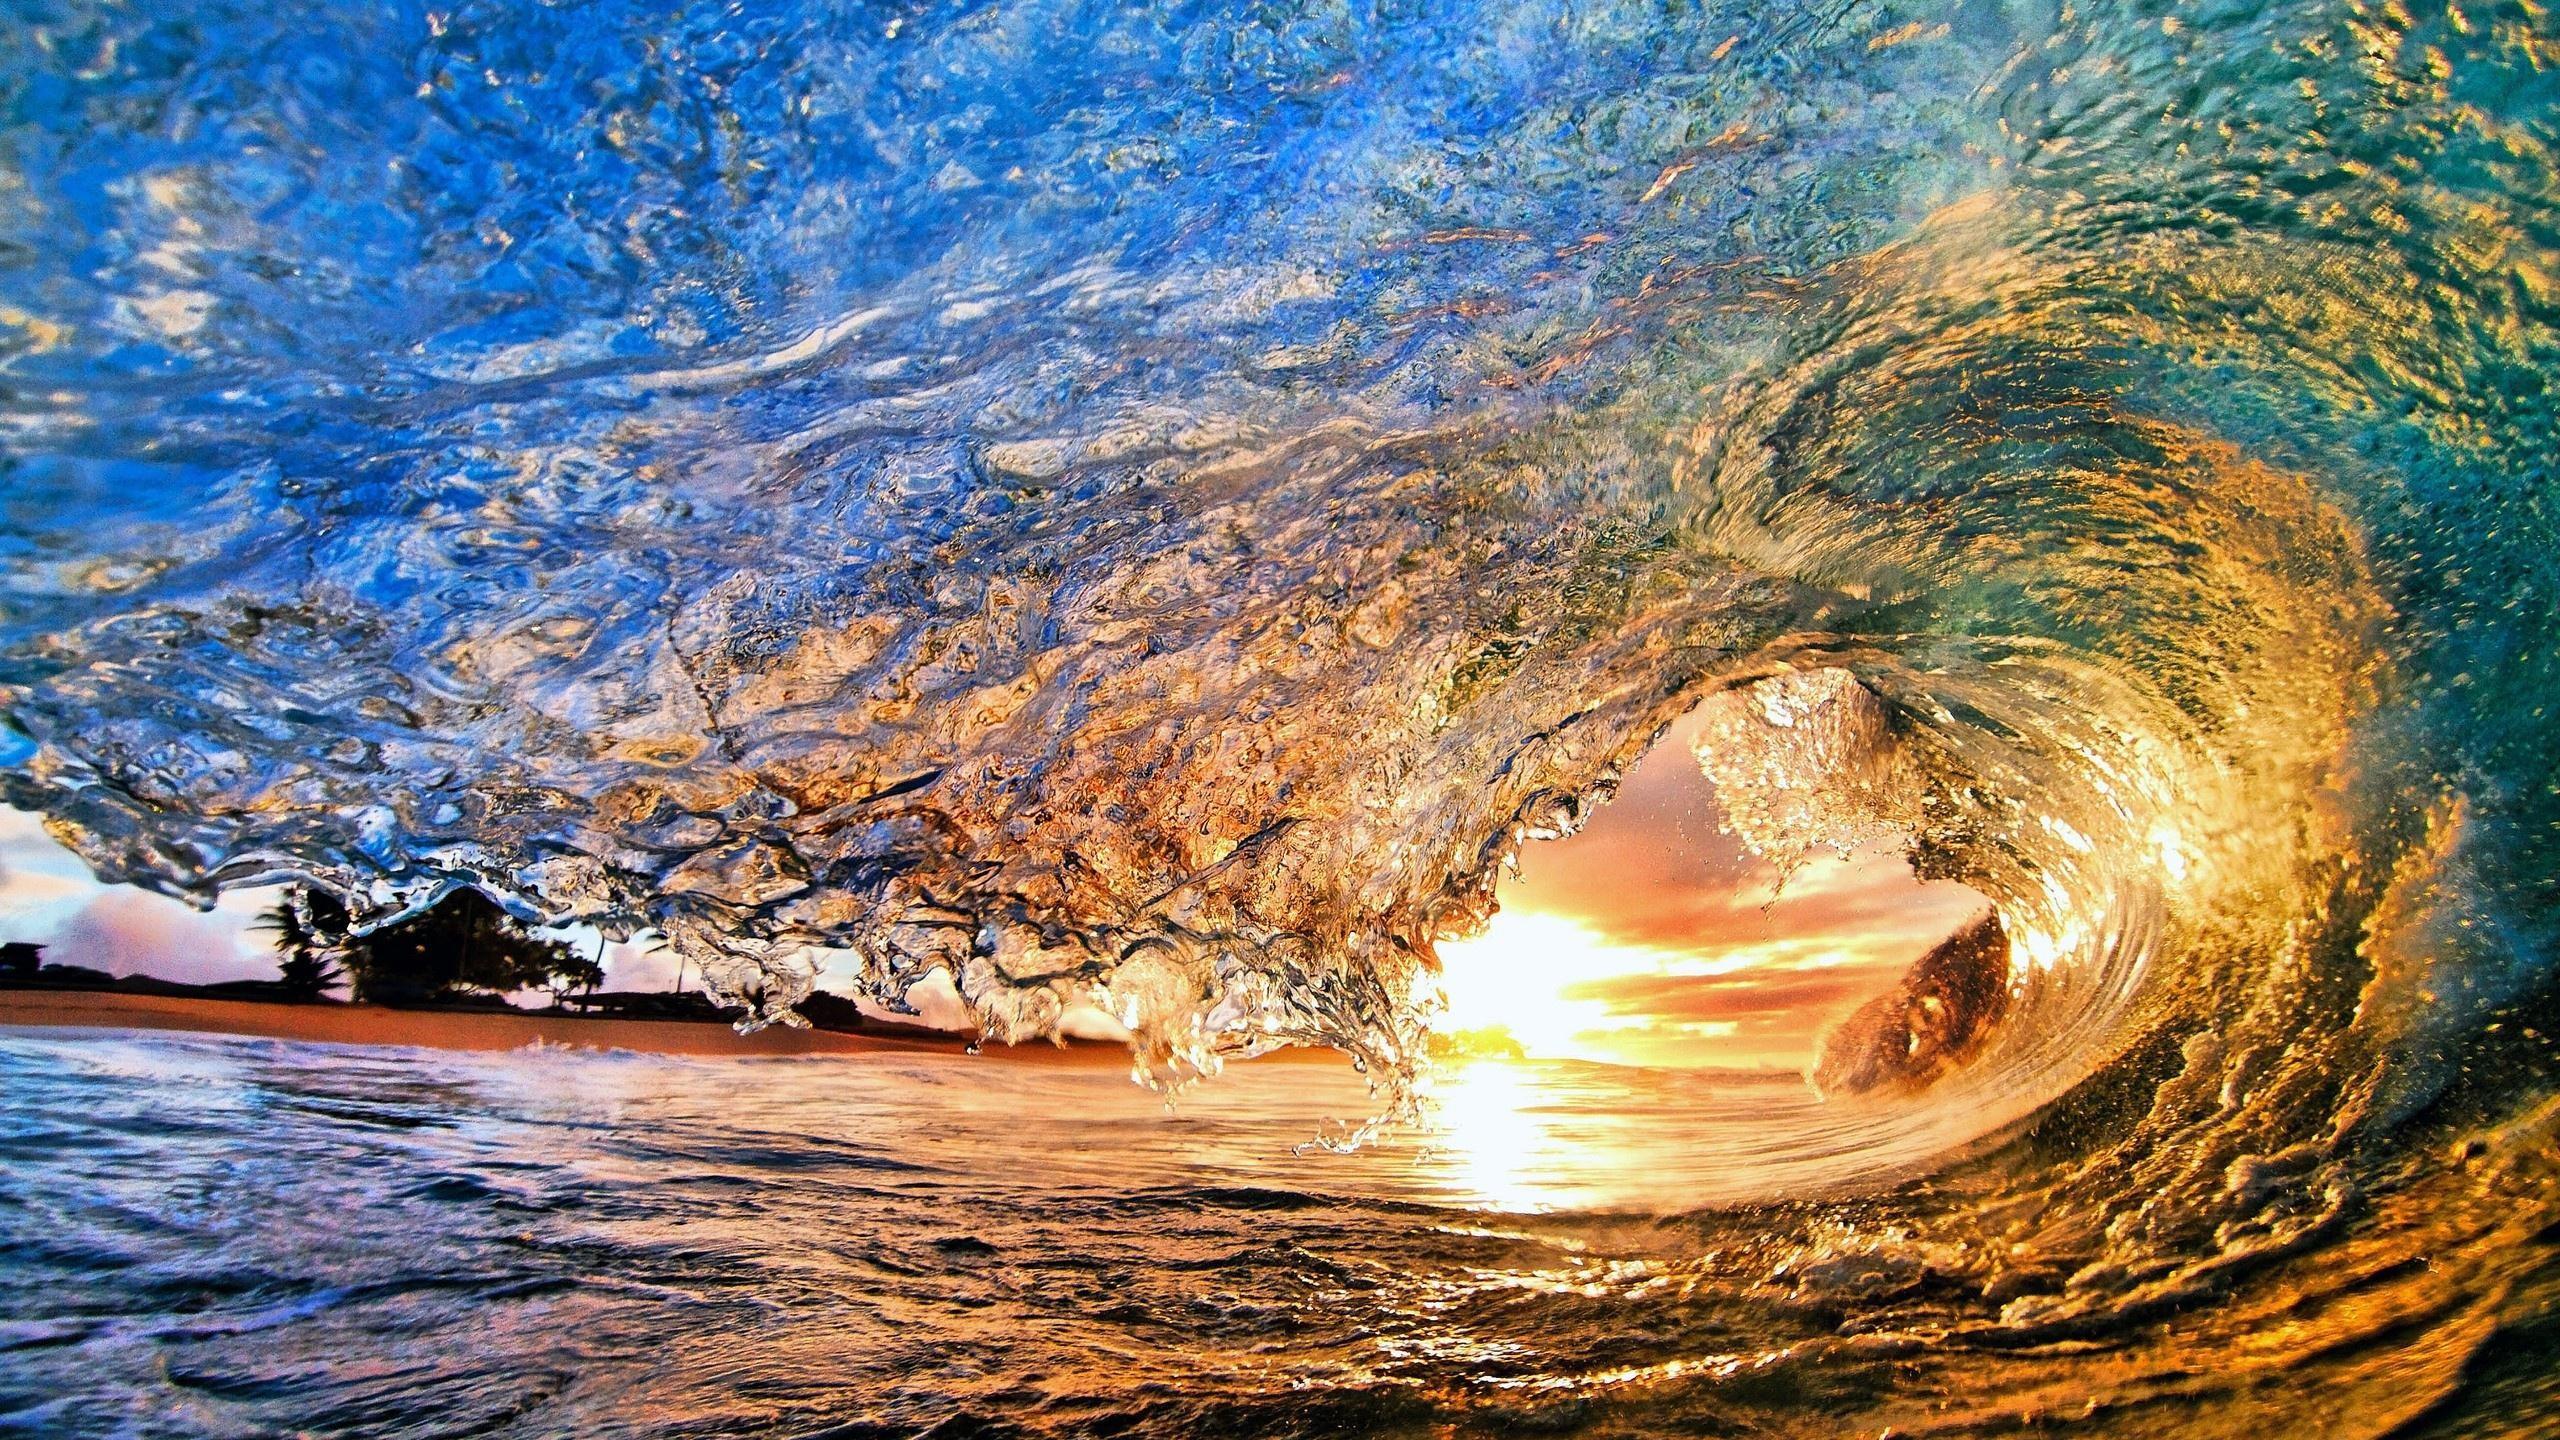 … 4K Ultra HD Hawaii Wallpapers and Photos, | By Murray Grunwald